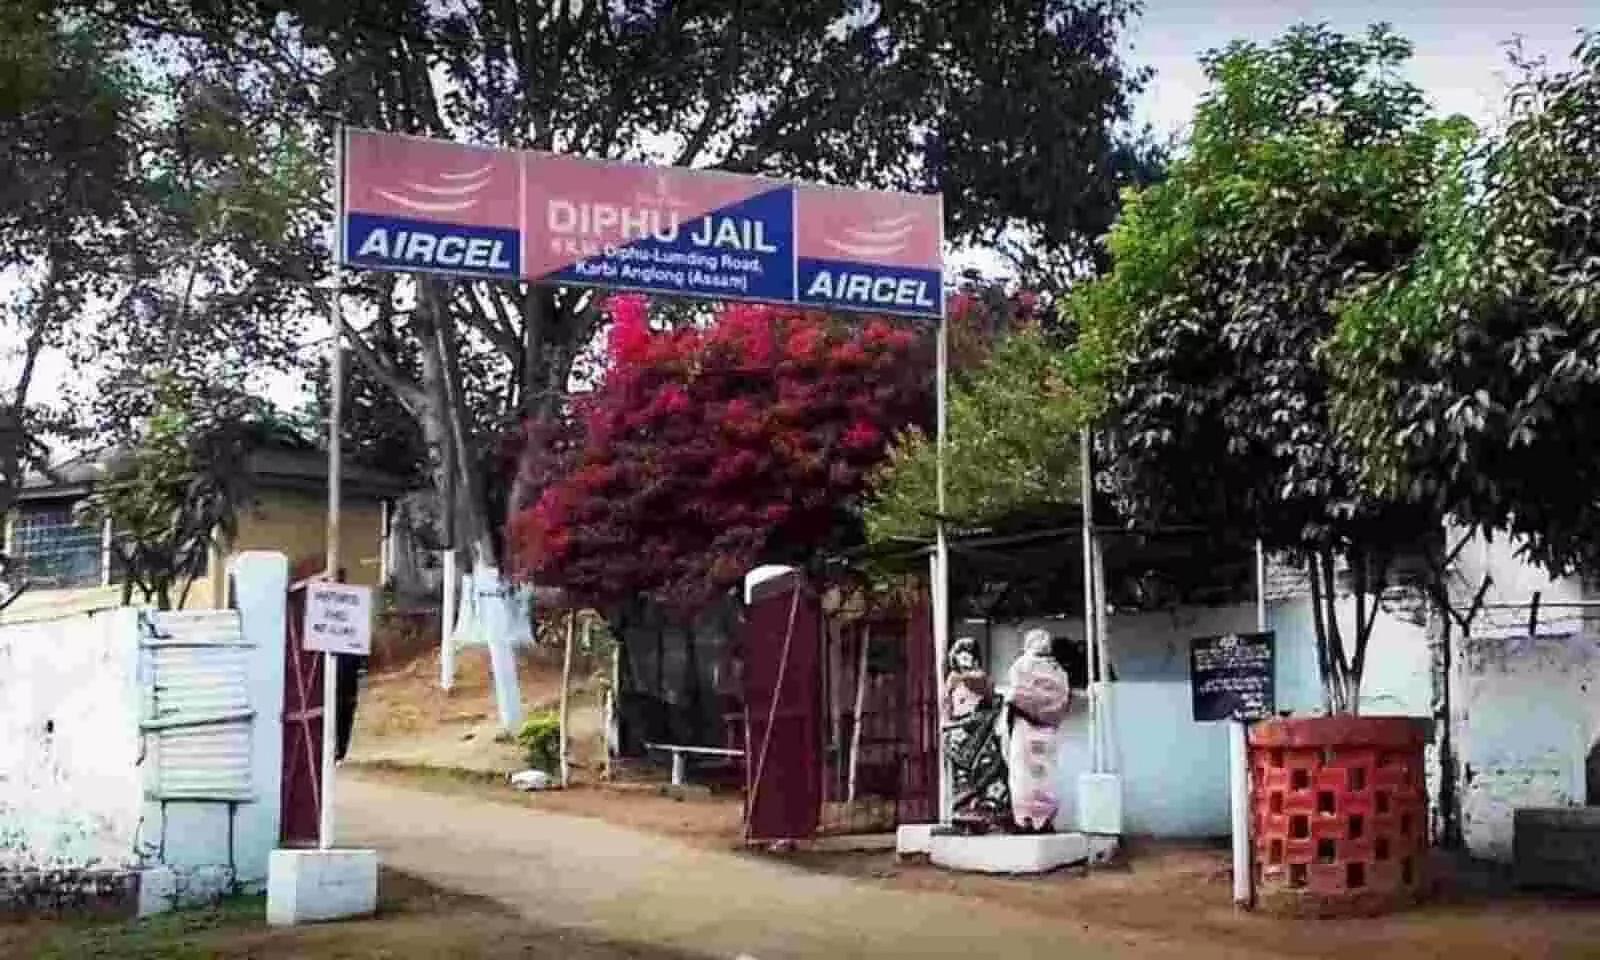 183 inmates of Diphu Jail in Assam test positive for coronavirus